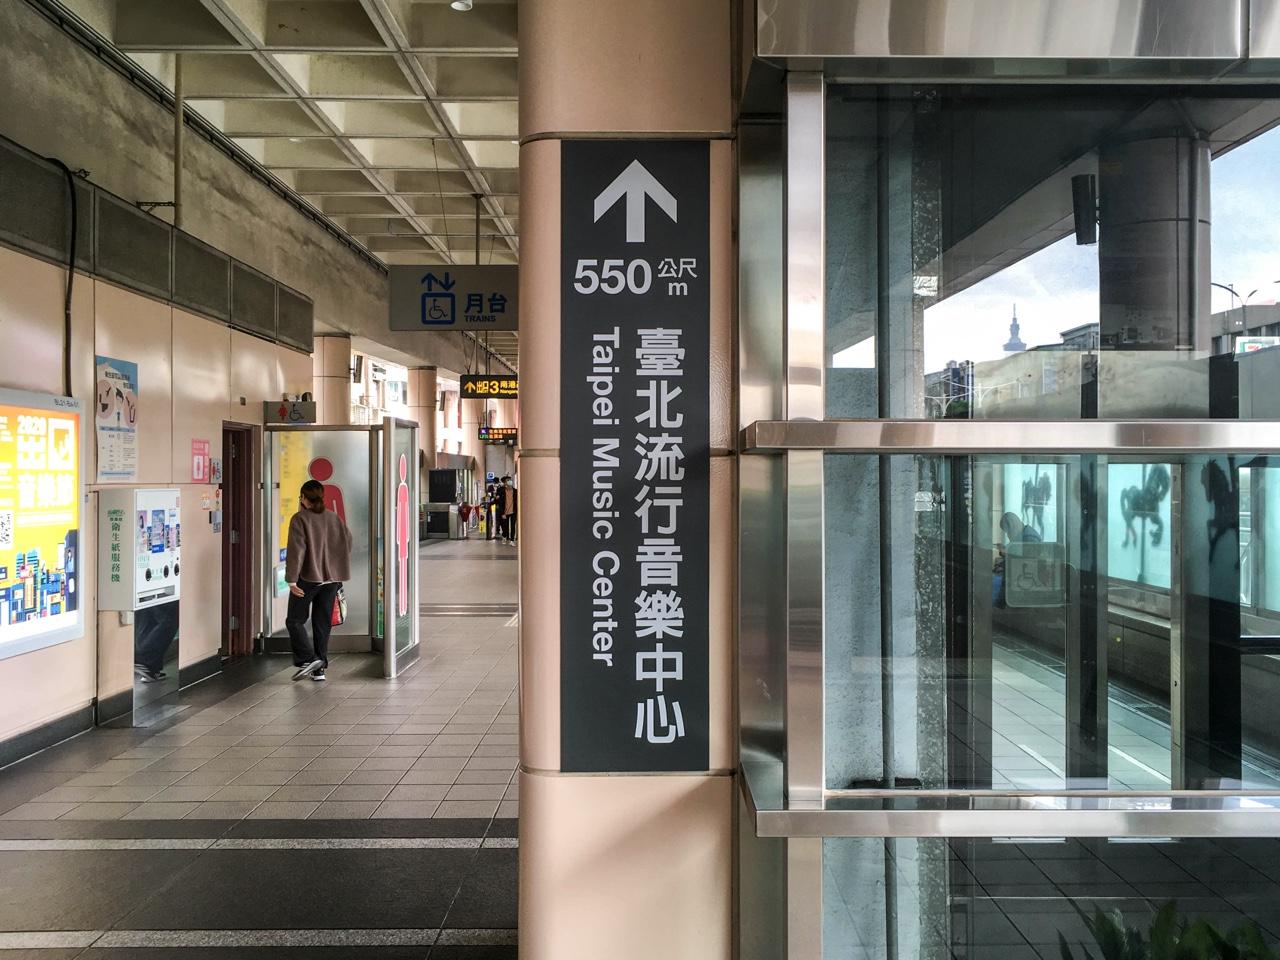 台北MRT昆陽駅の案内